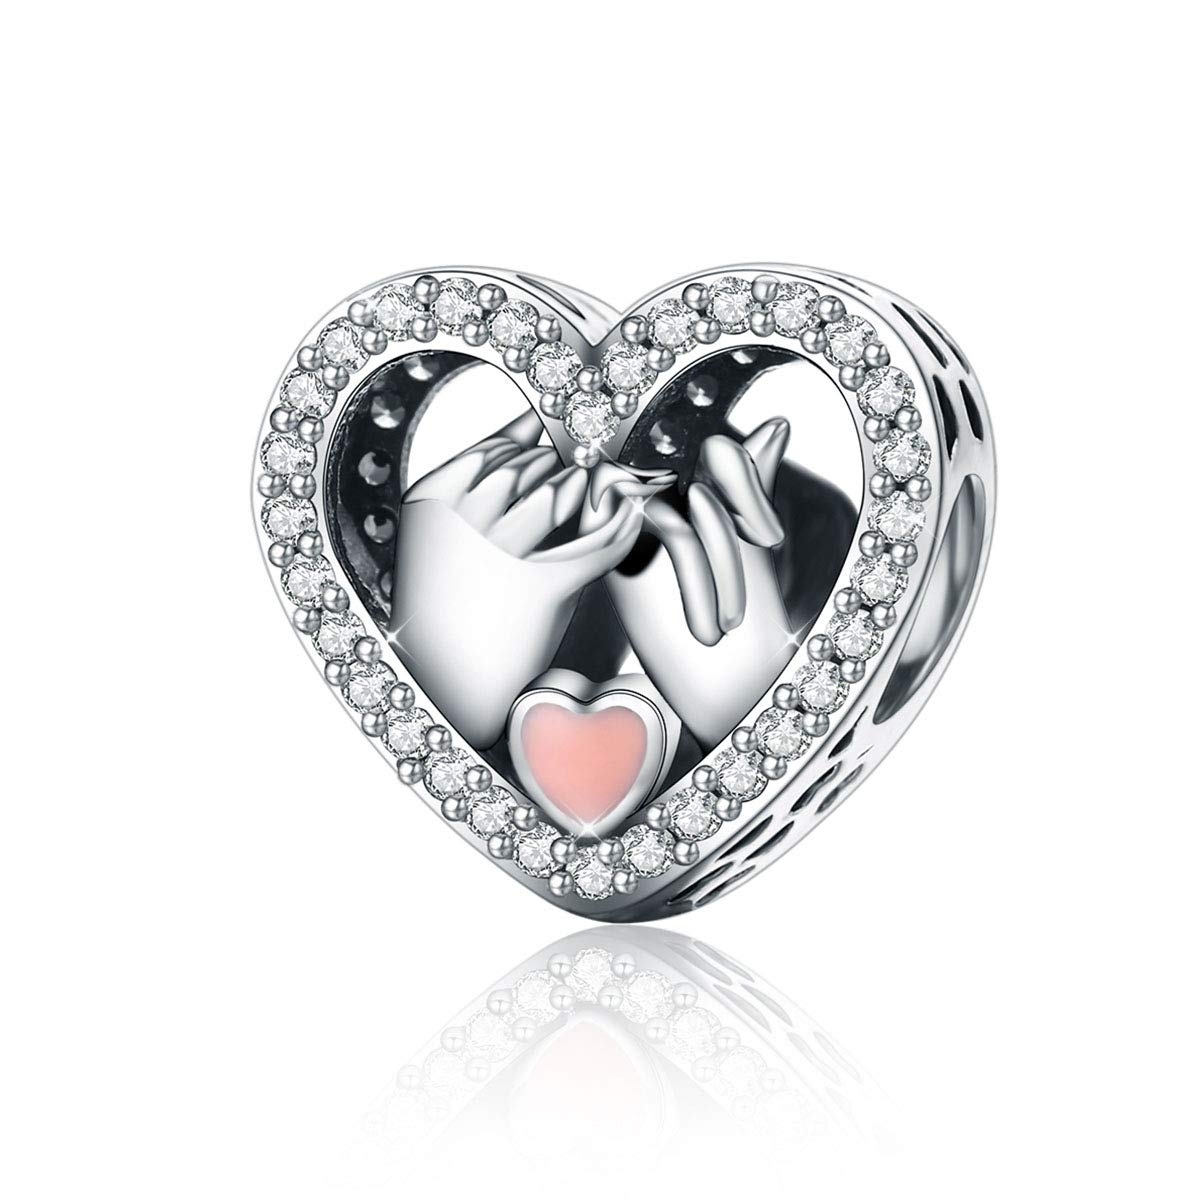 Abalorios de plata de ley 925 con forma de corazón compatible con pulseras Pandora